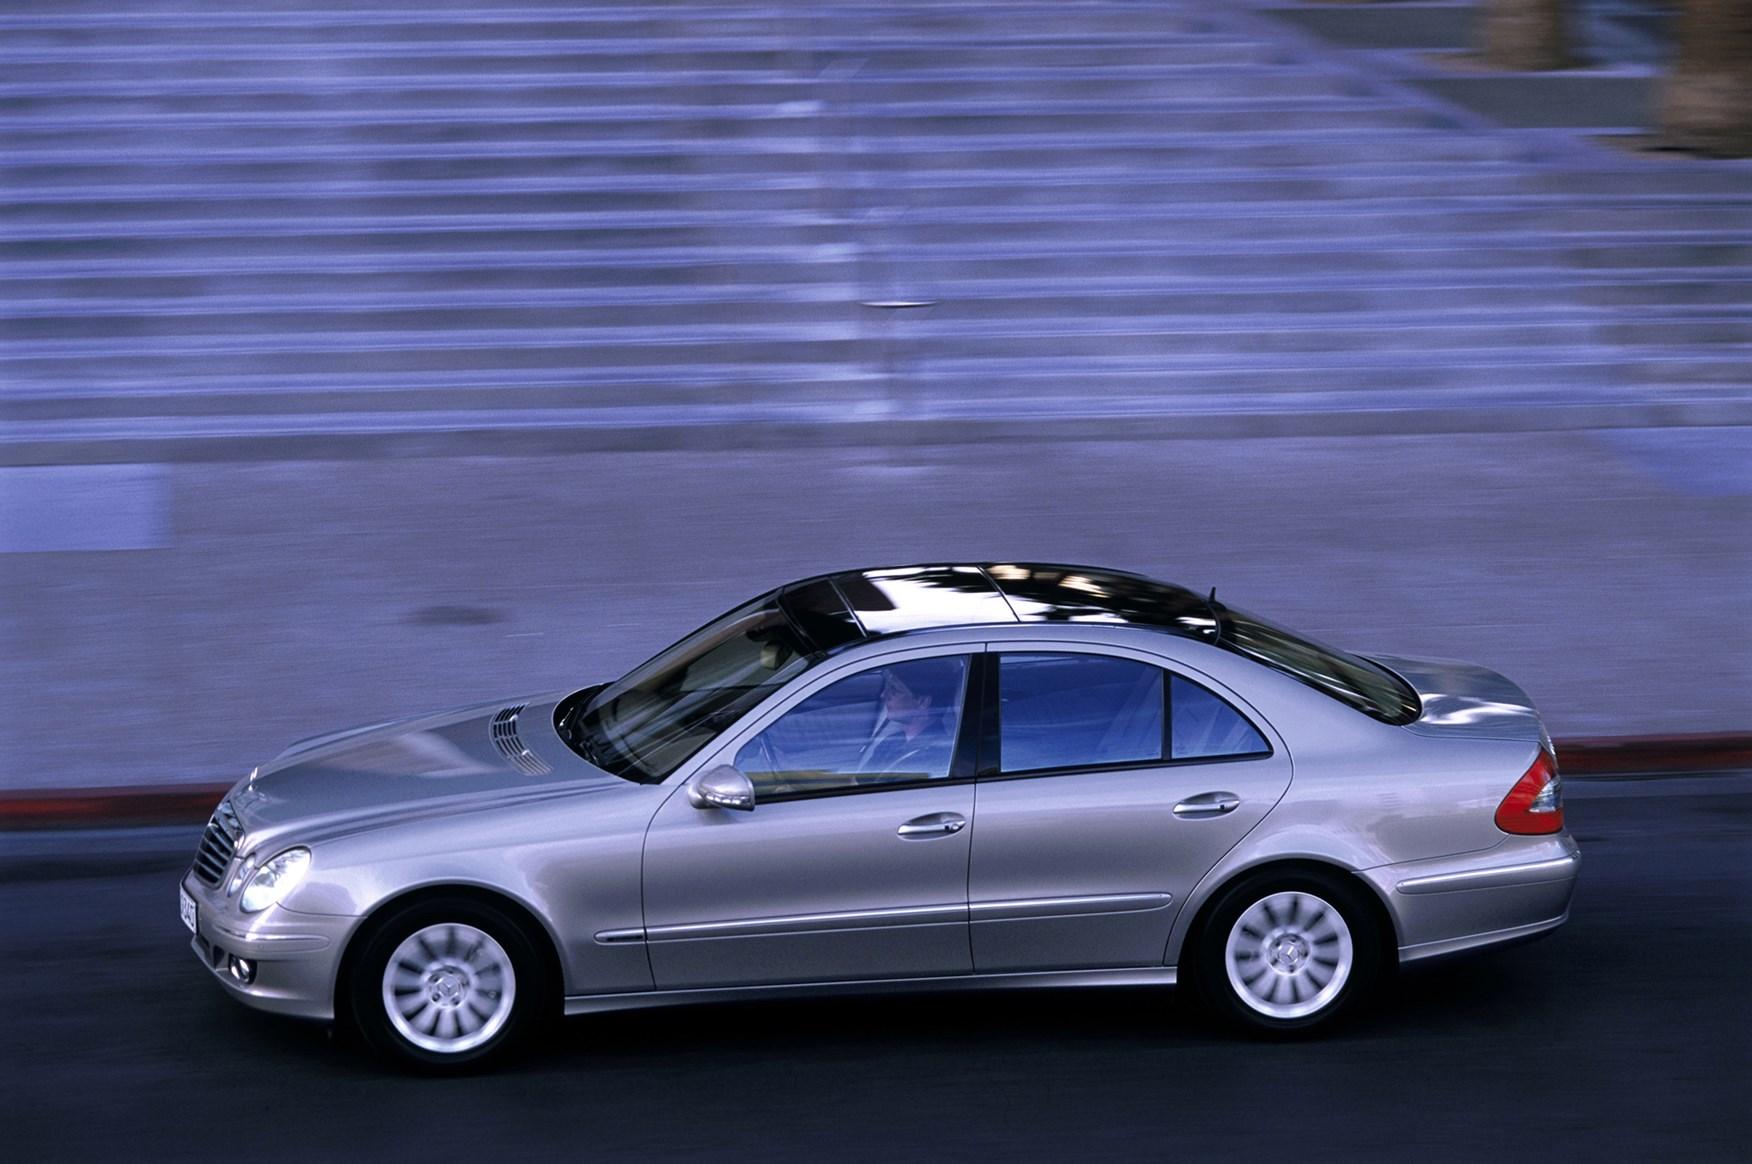 Mercedes Benz E Class Saloon Review 2002 2008 Parkers 2003 E500 Air Suspension Diagram Wiring Schematic